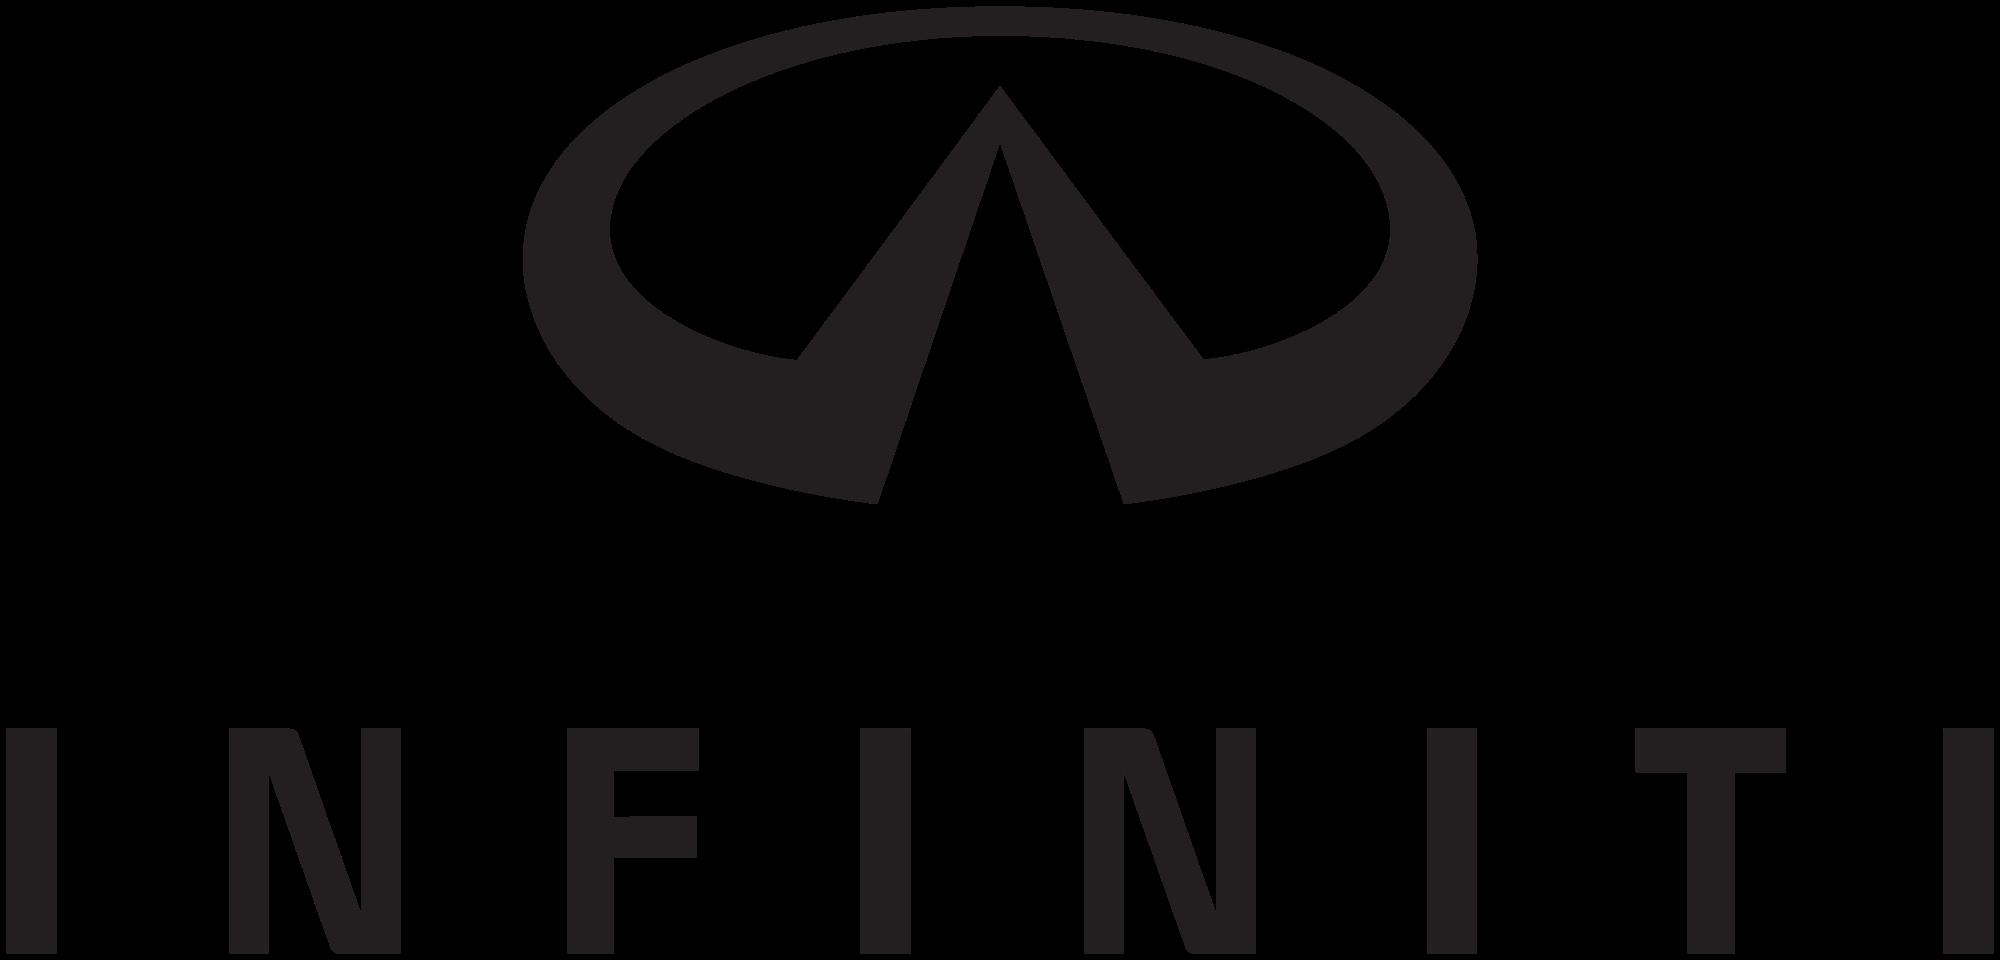 Infiniti логотип PNG